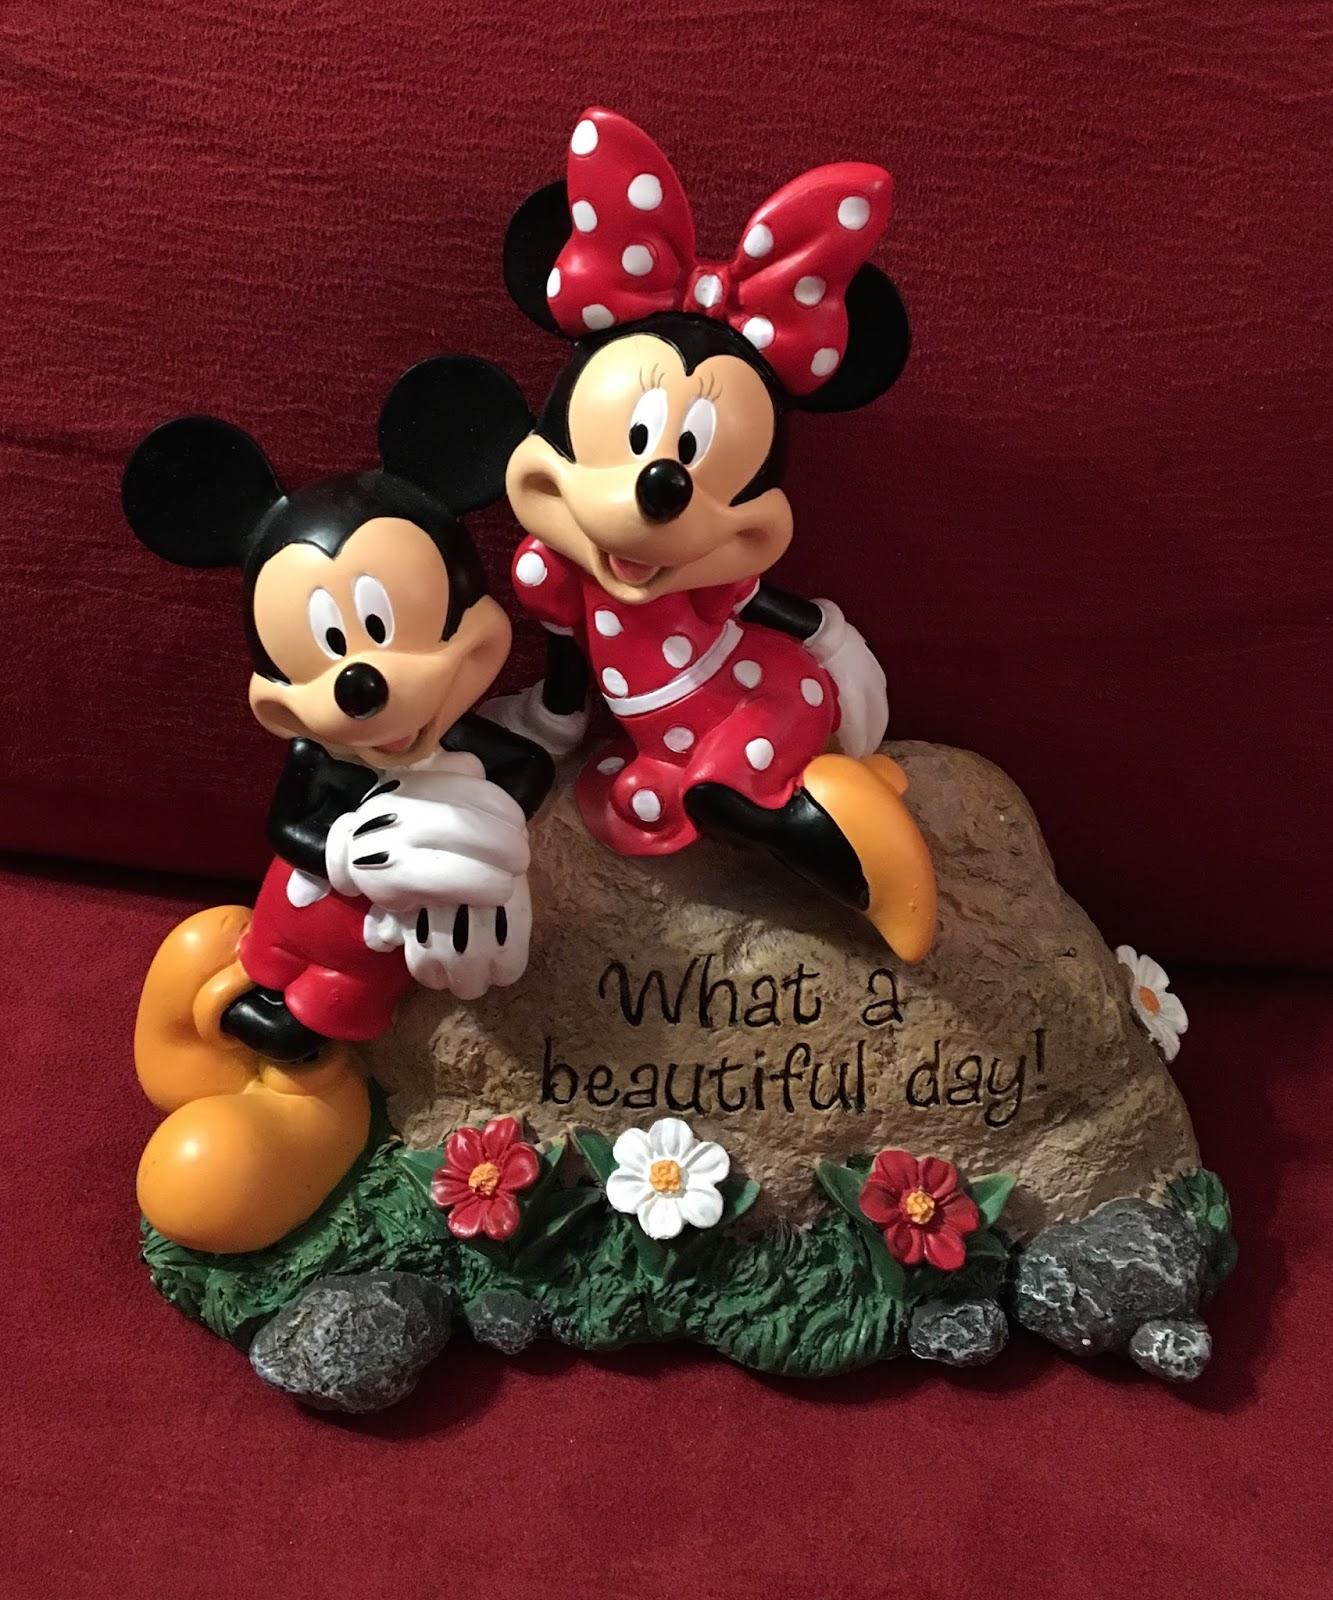 My Disney Life Christmas 2015